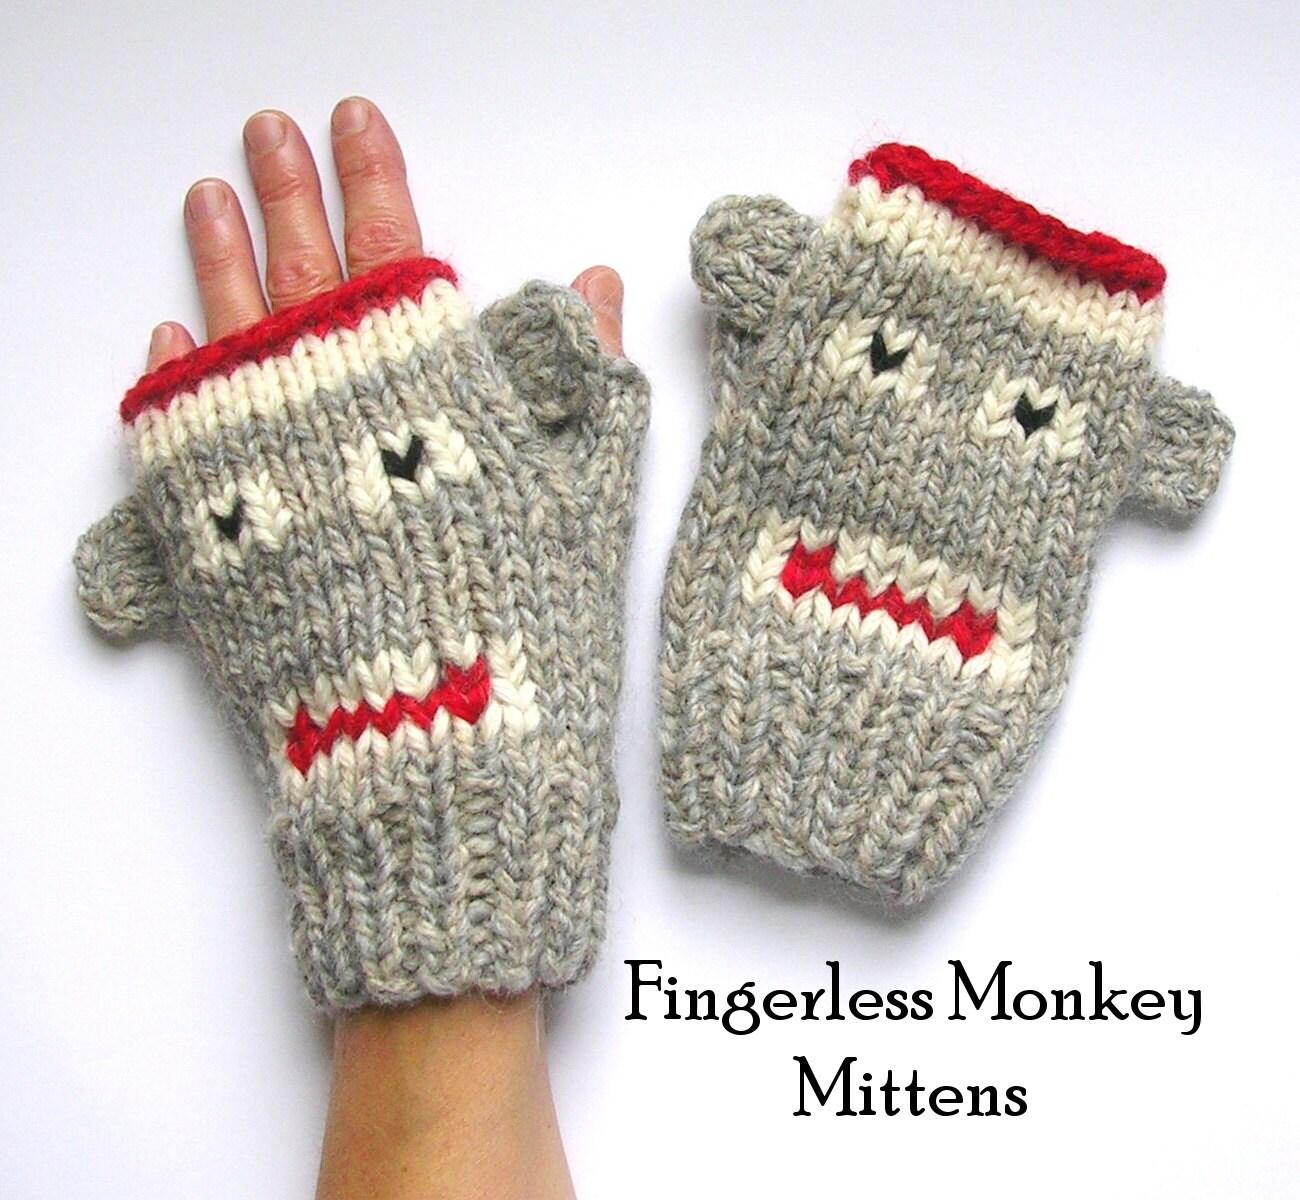 Knitting Patterns Sock Yarn Mittens : Fingerless Monkey Mitten Knitting Pattern Sock Monkeys